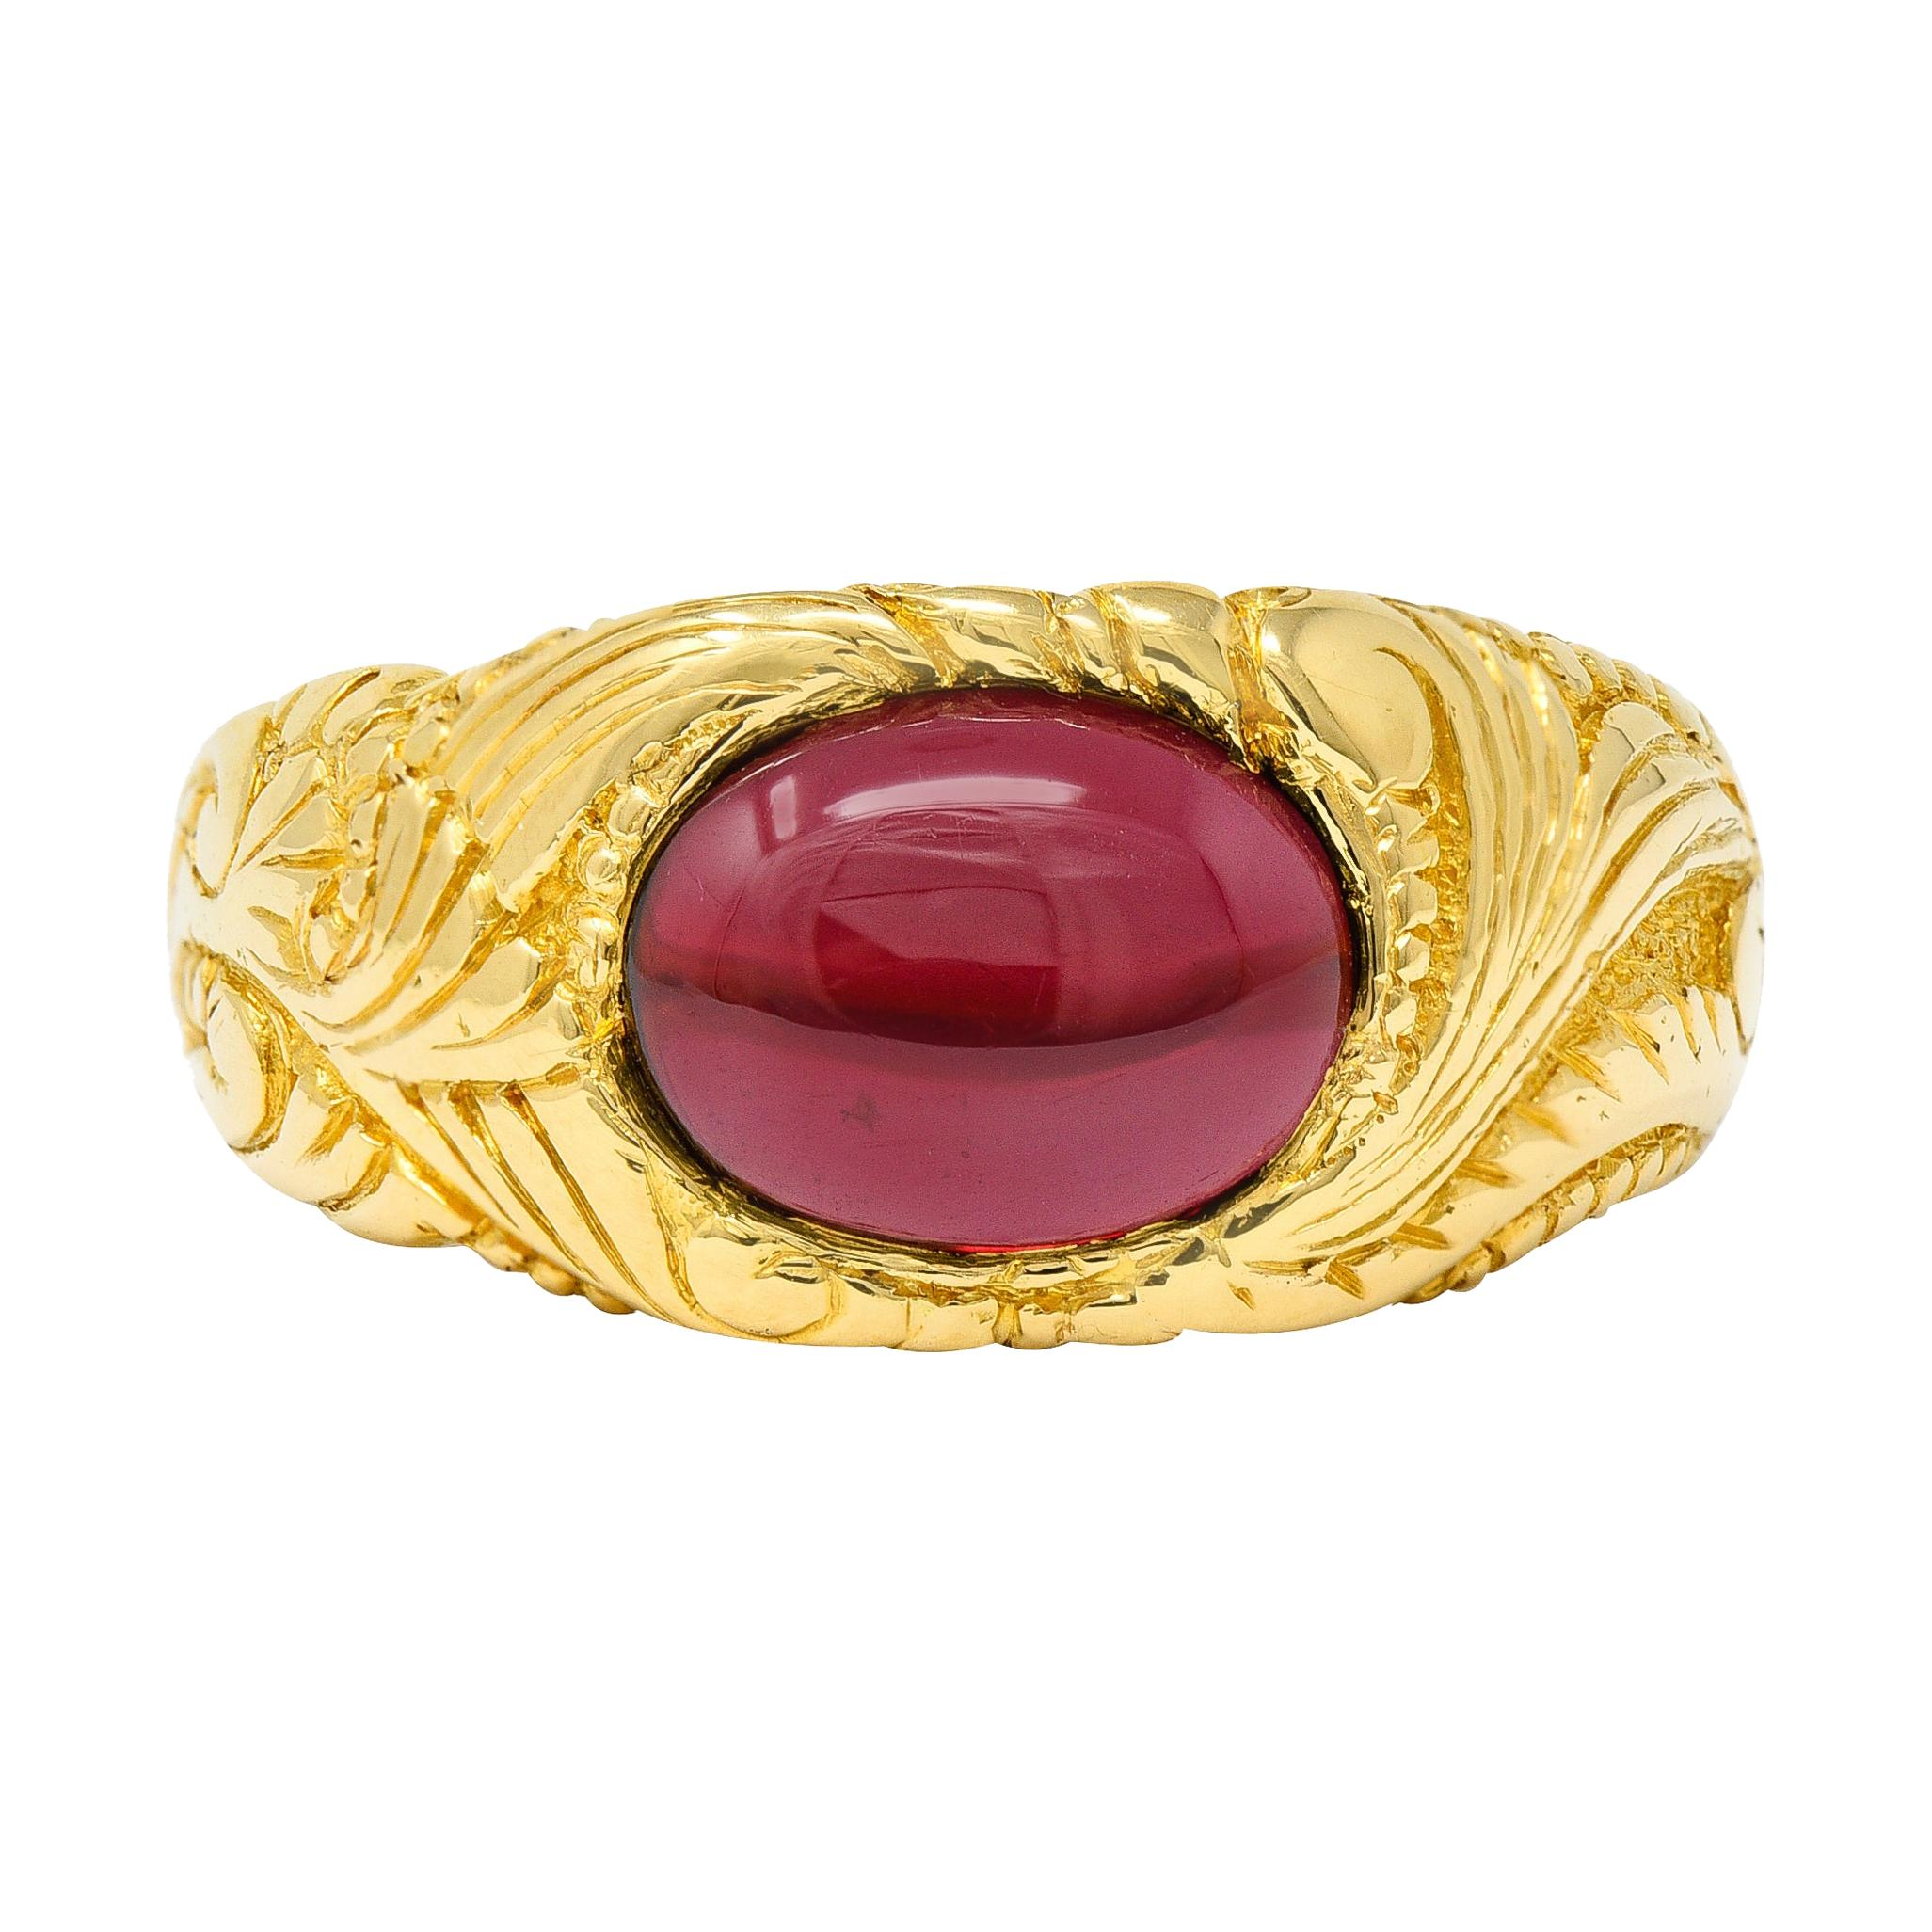 Tiffany & Co. Rhodolite Garnet Cabochon 18 Karat Gold Art Nouveau Ring